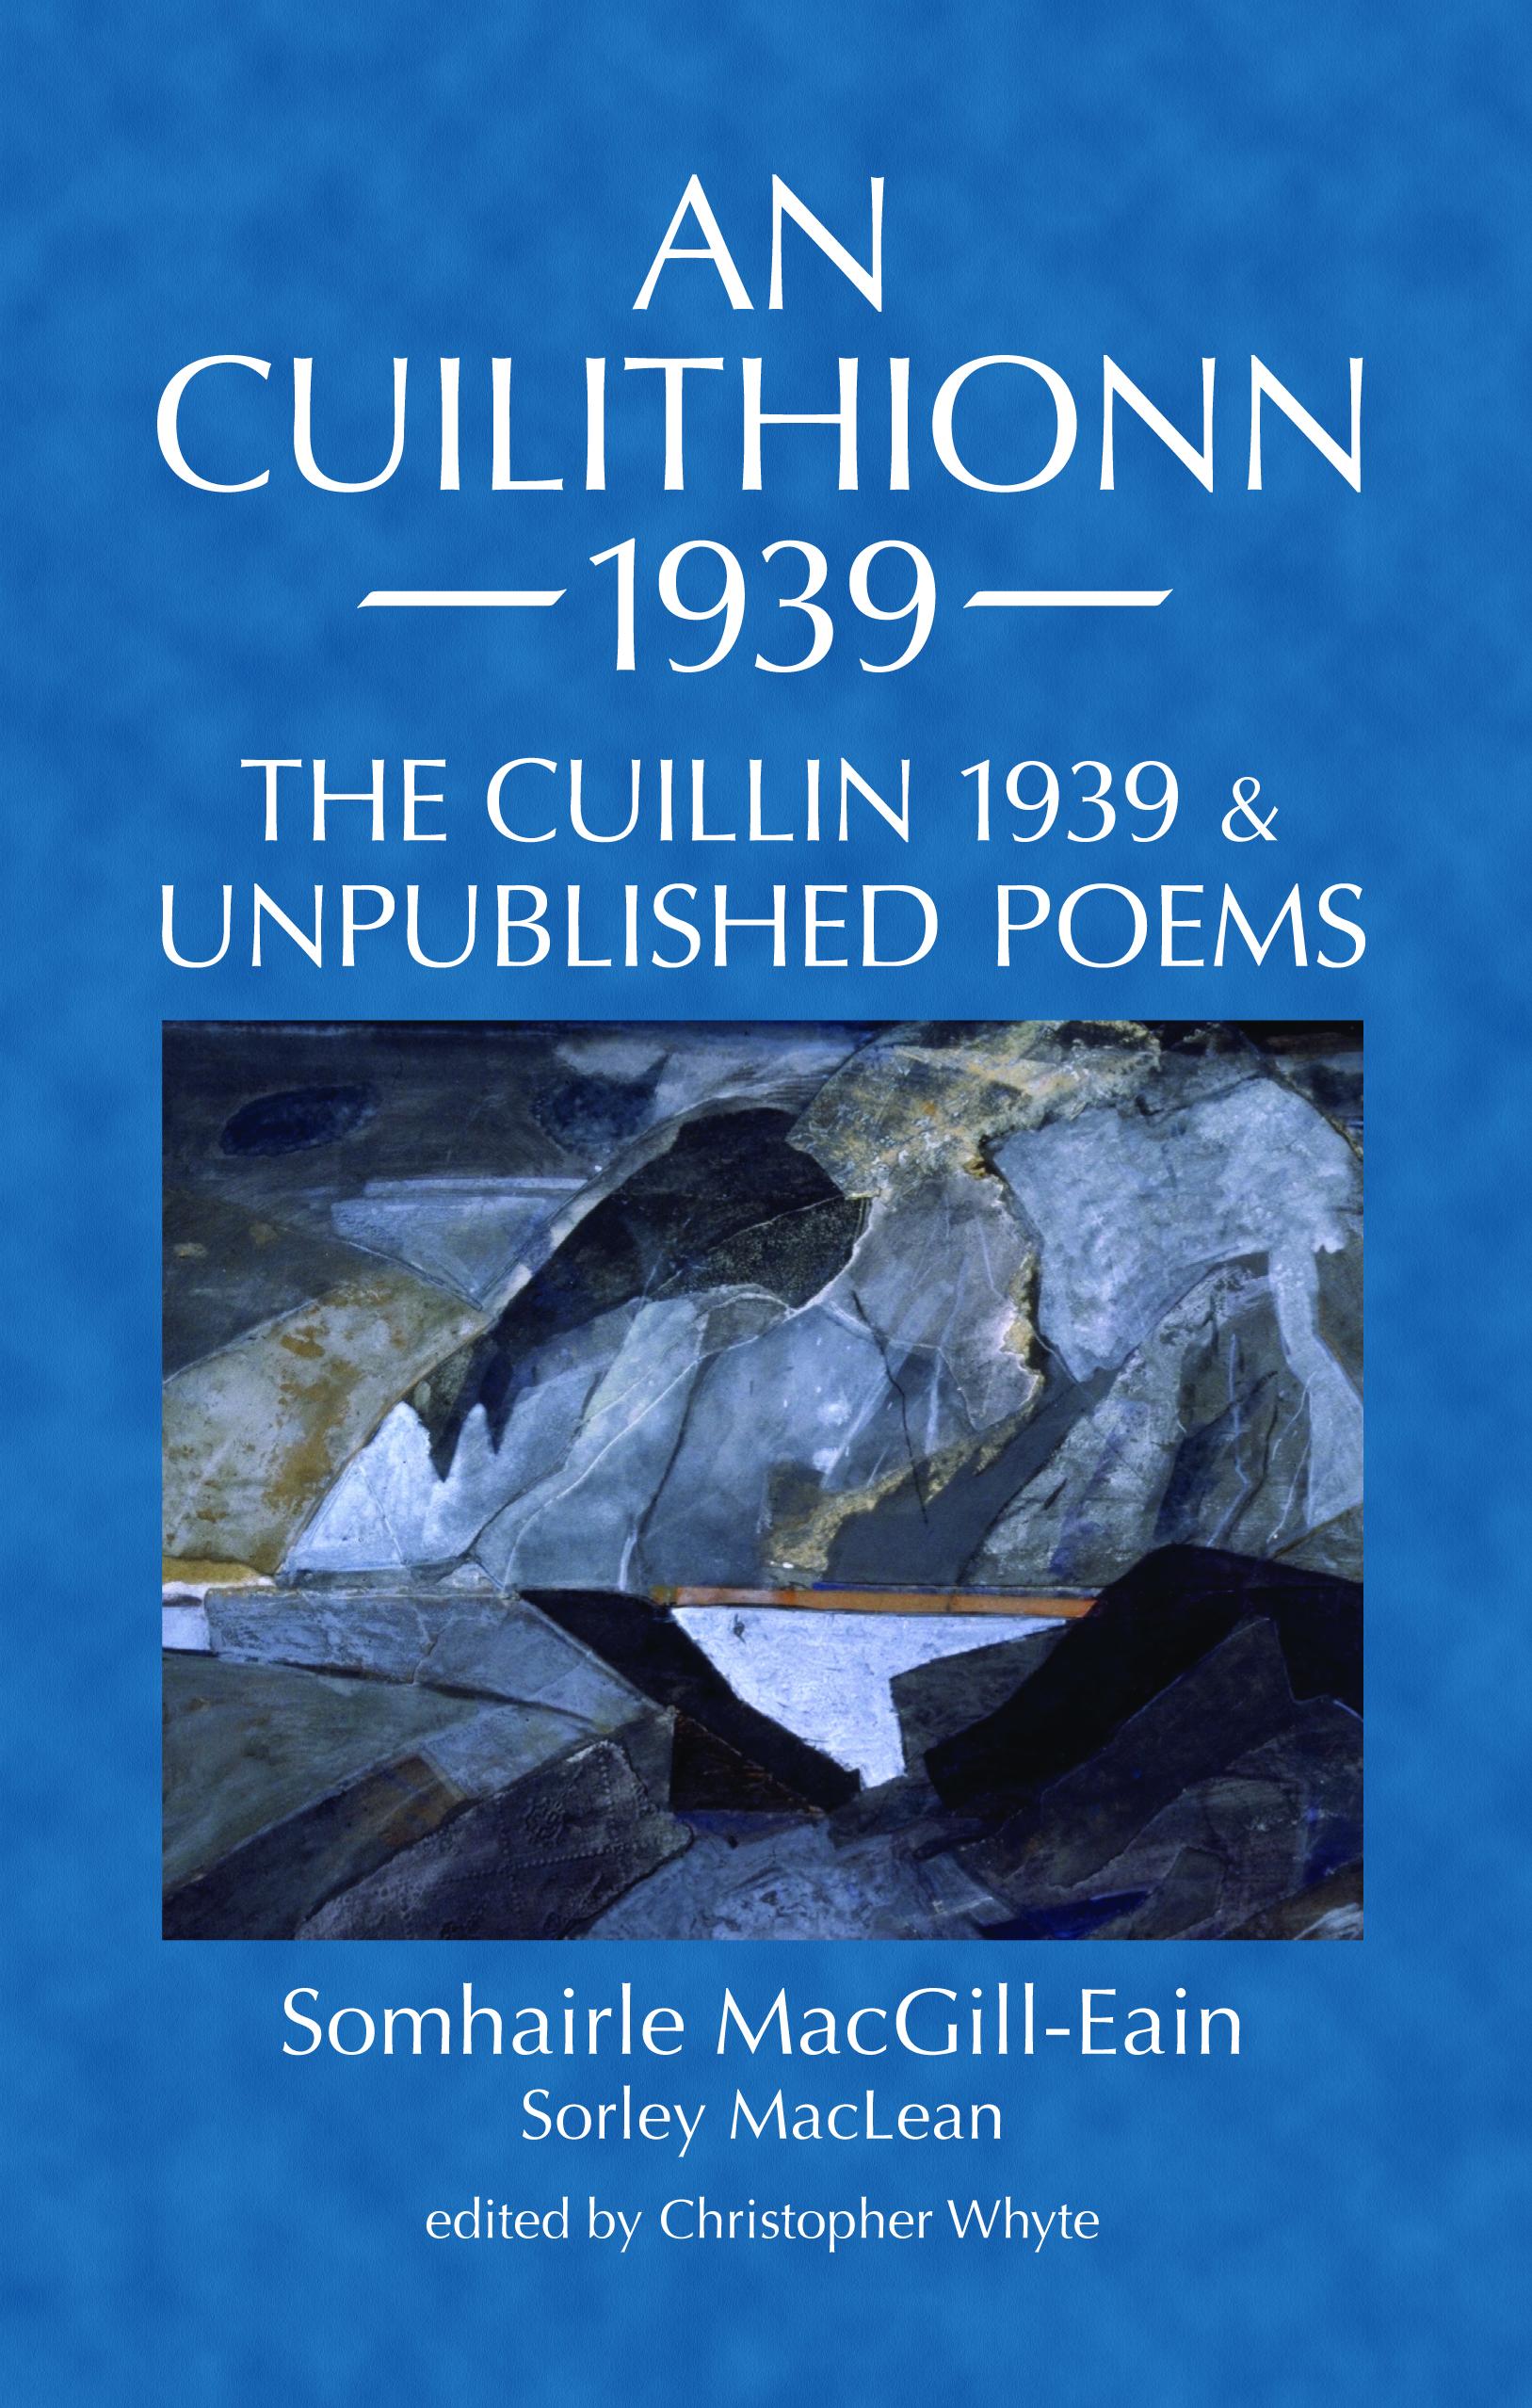 An Cuilithionn | The Cuillin